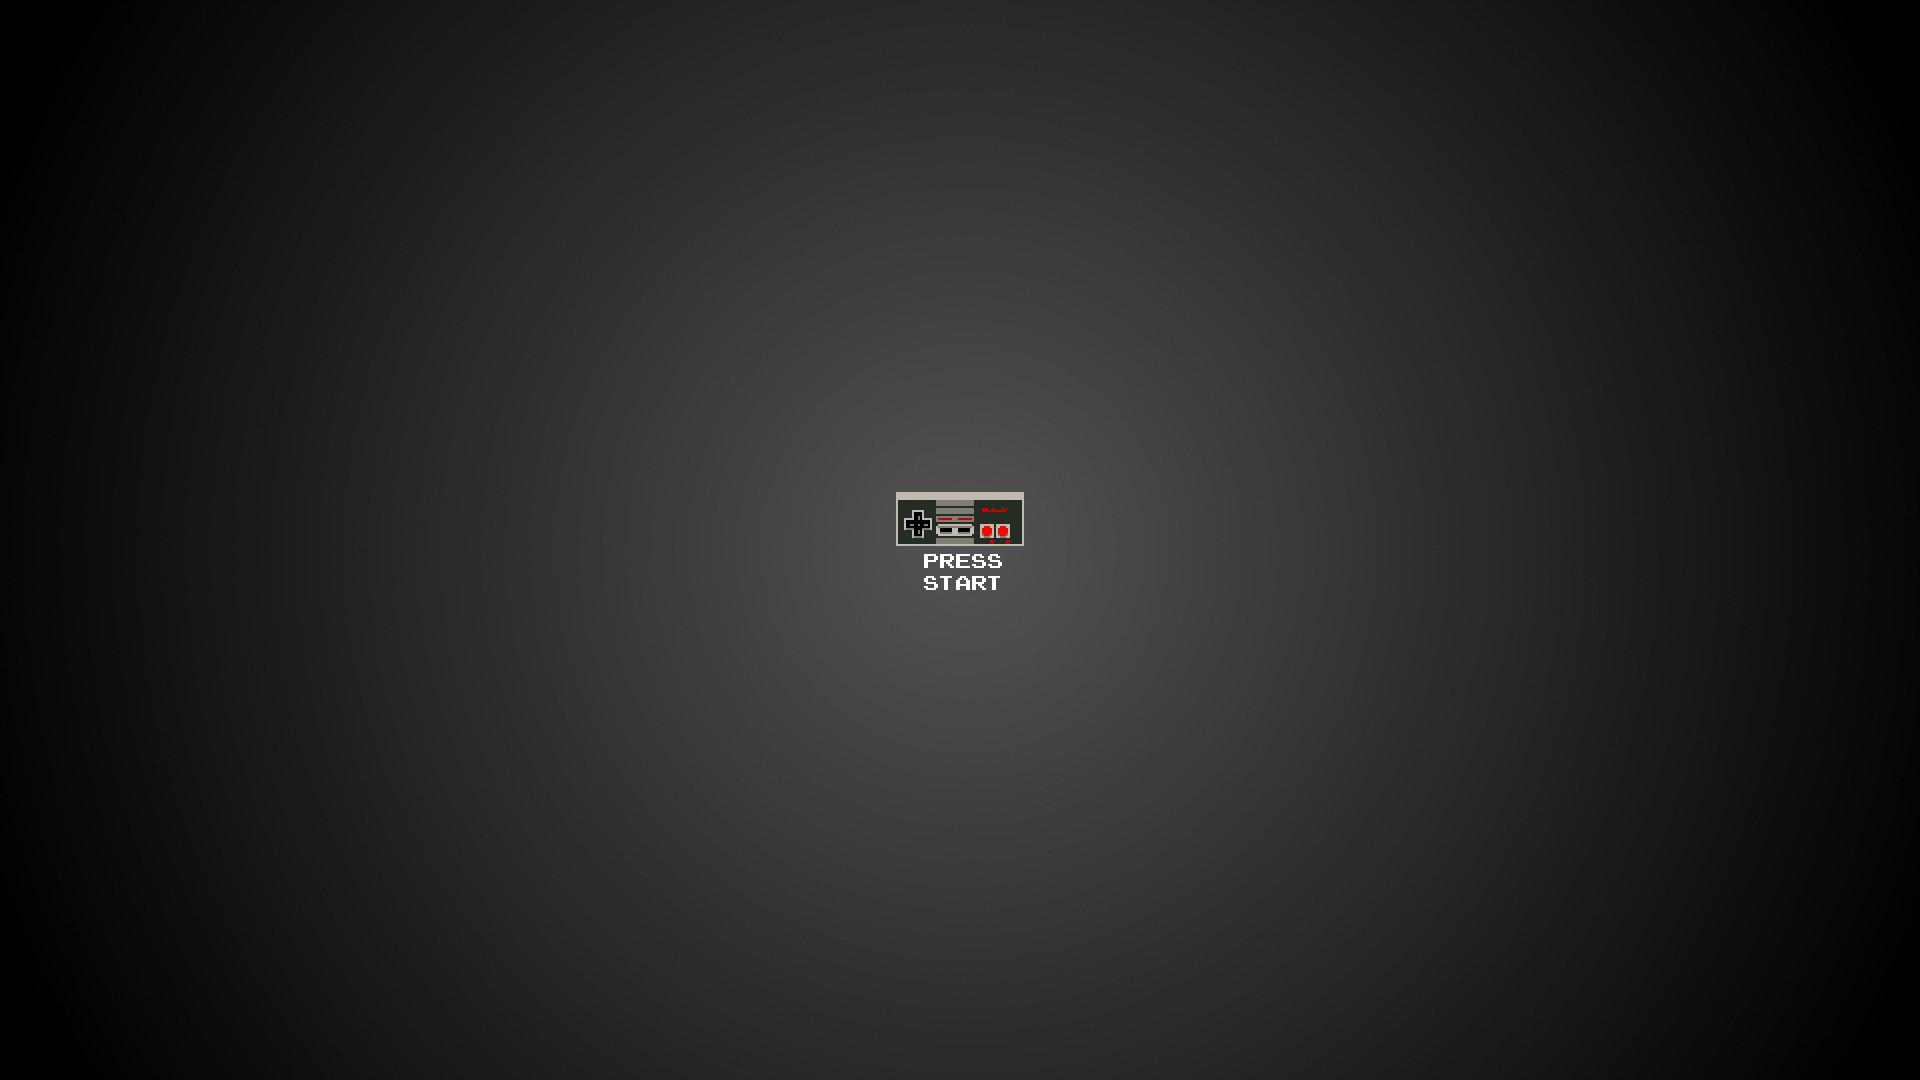 Game Controller HD Rare Wallpaper Free – Download Game Controller HD Rare  Wallpaper